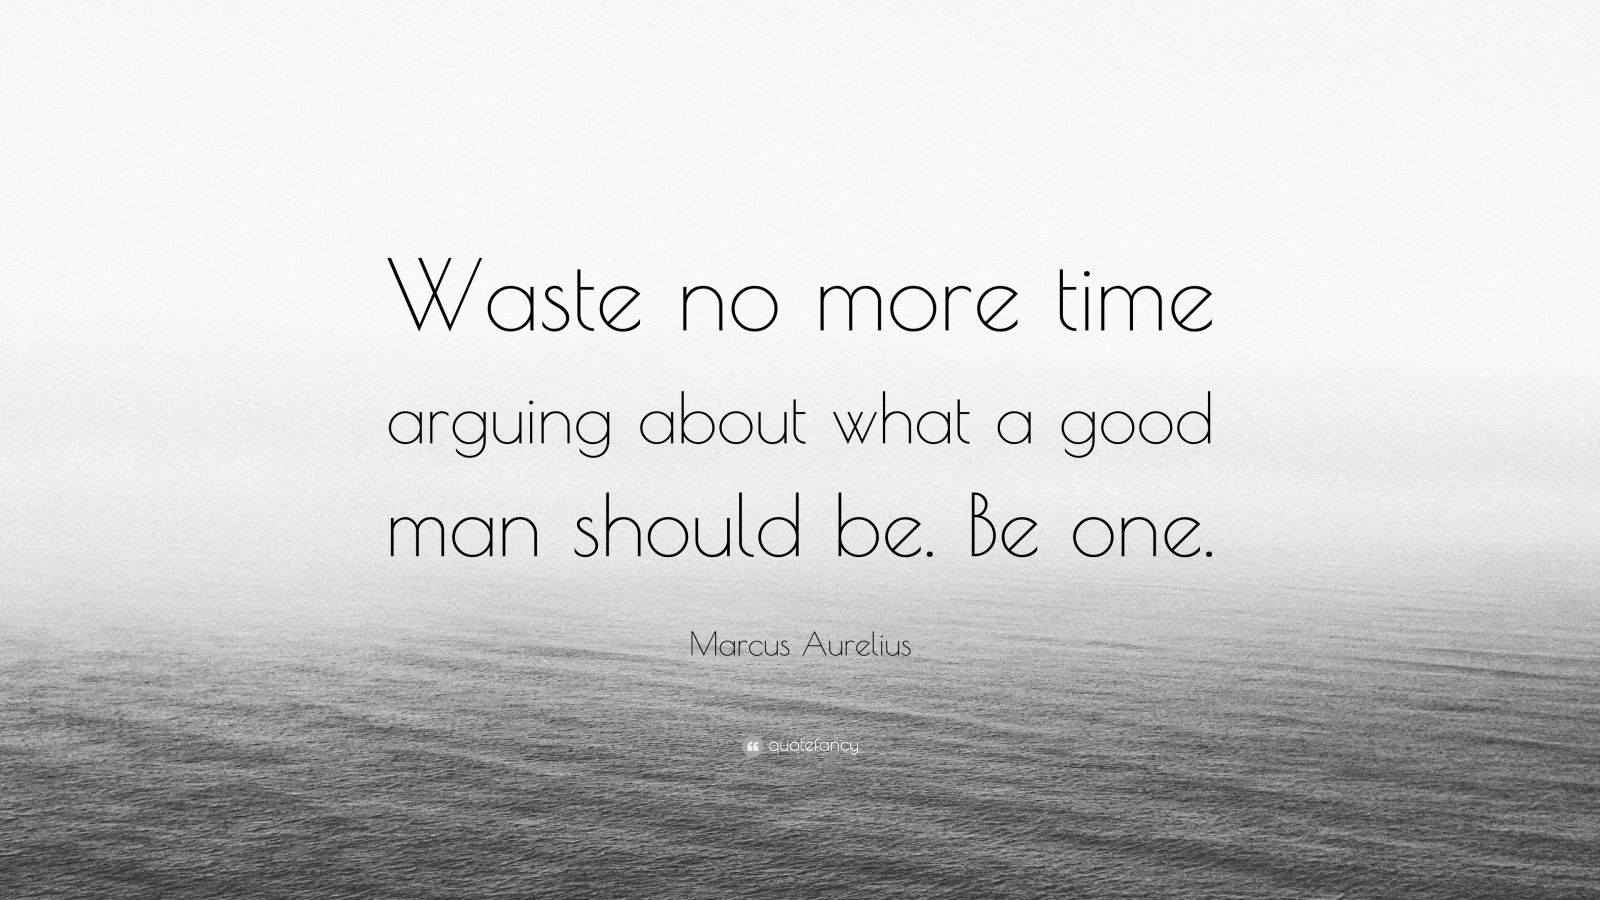 Steve Jobs Motivational Quotes Wallpaper Marcus Aurelius Quote Waste No More Time Arguing About